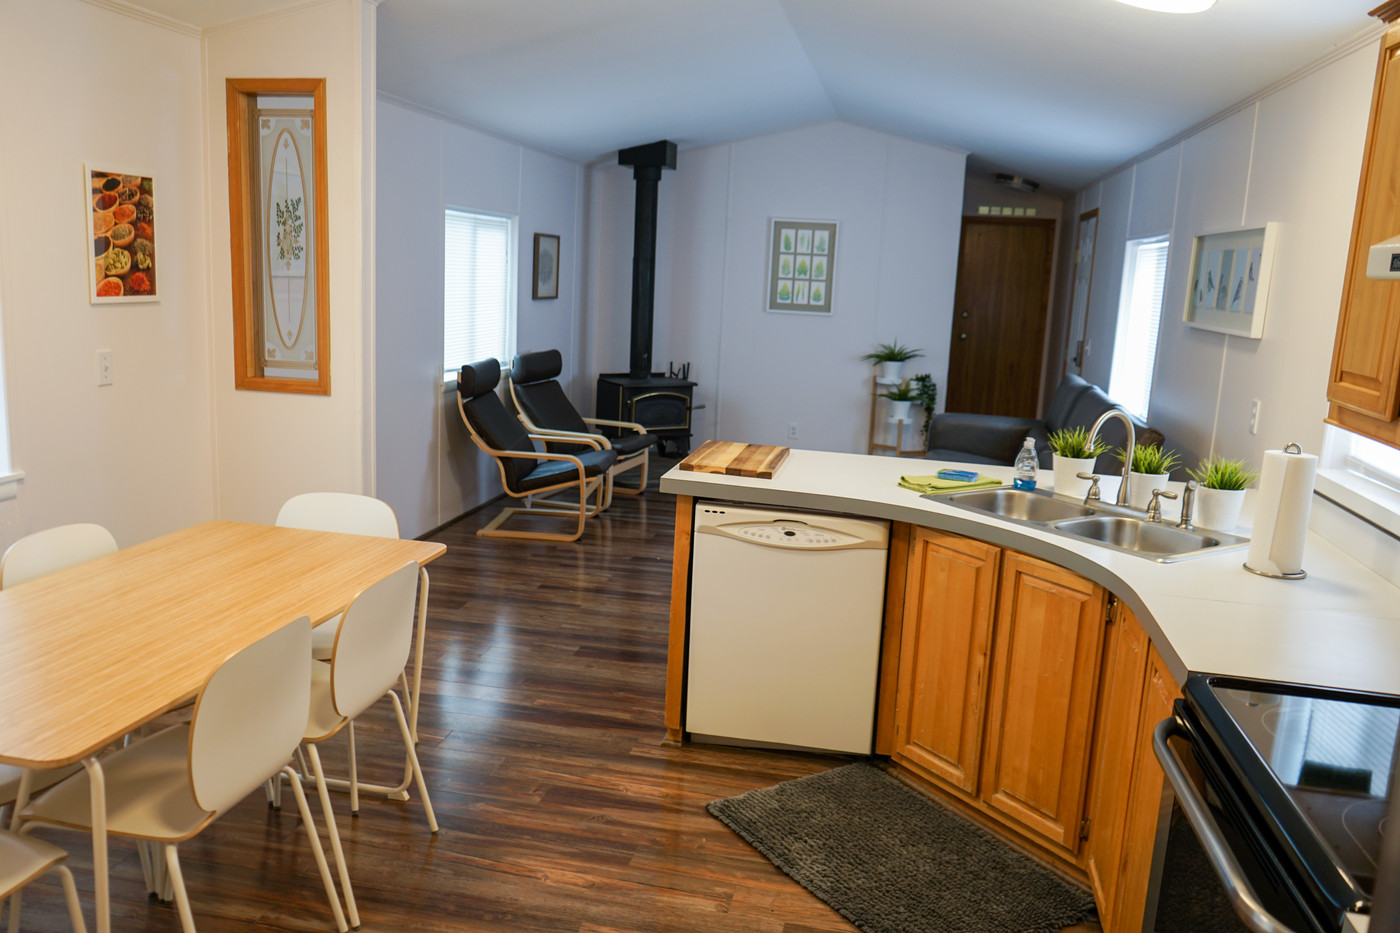 Park House Kitchen & Living Room